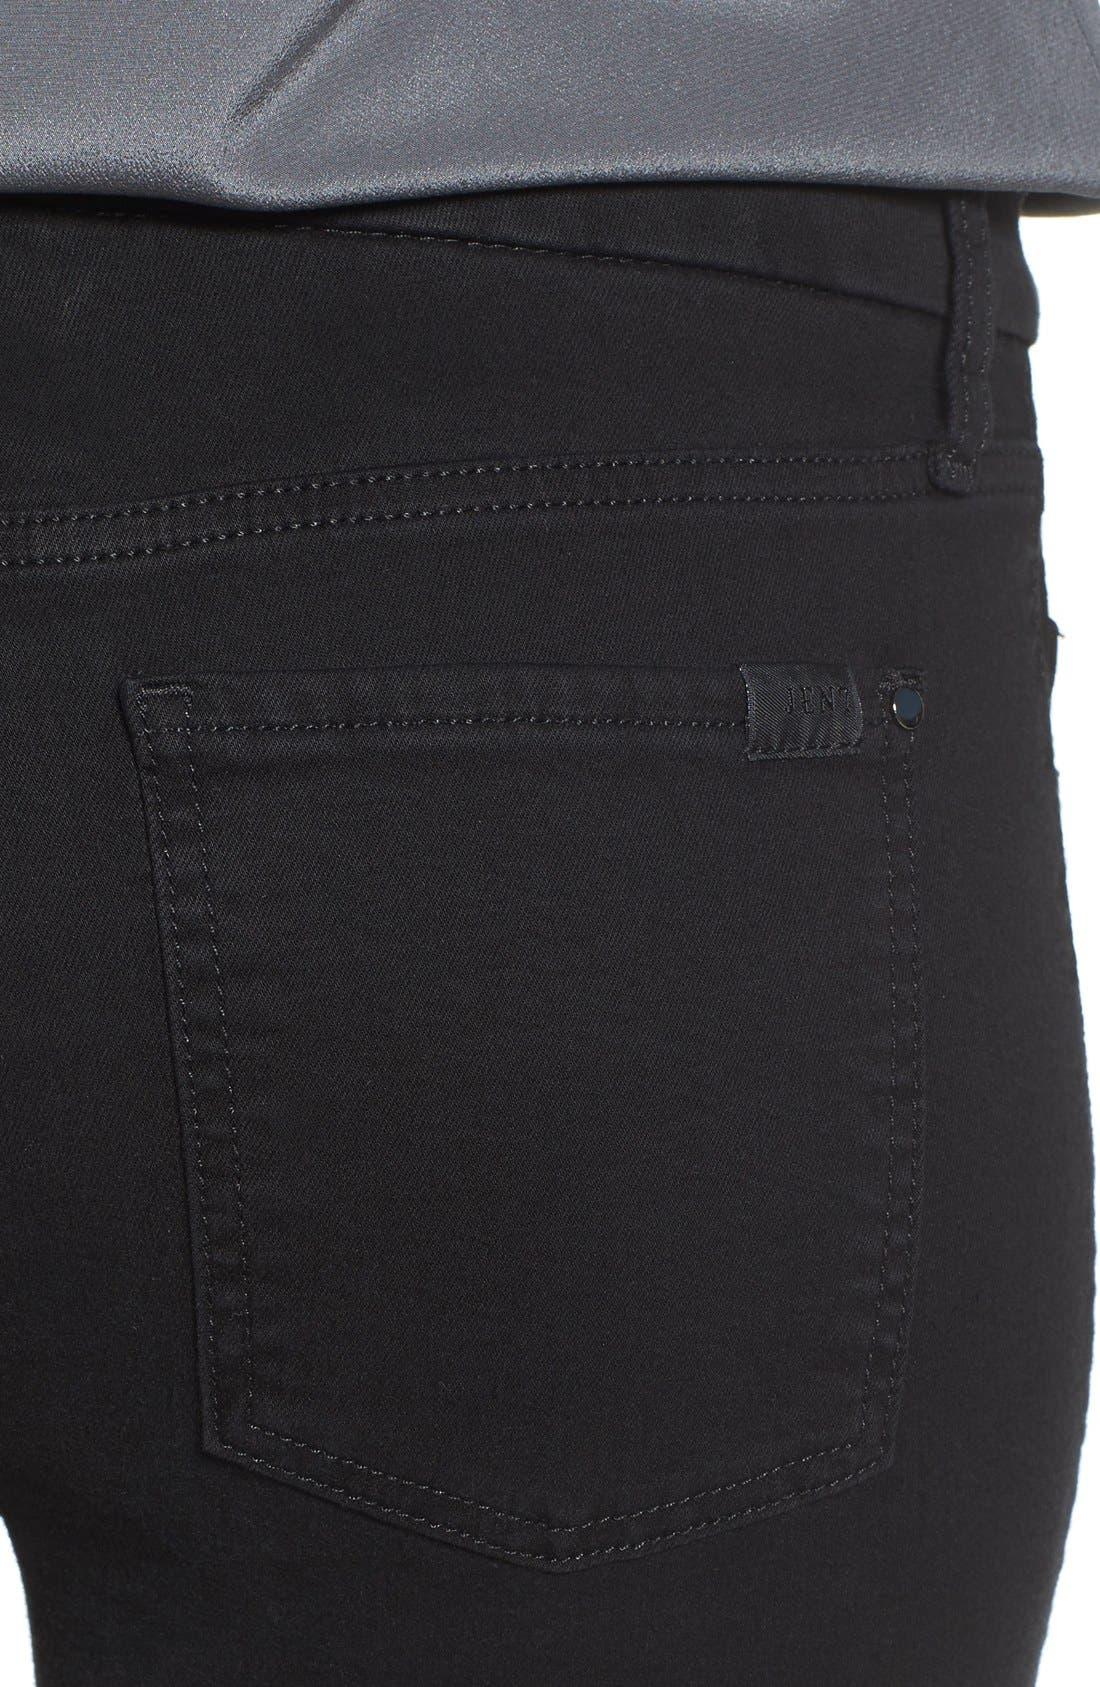 Tuxedo Stripe Skinny Jeans,                             Alternate thumbnail 4, color,                             Riche Touch Black Noir